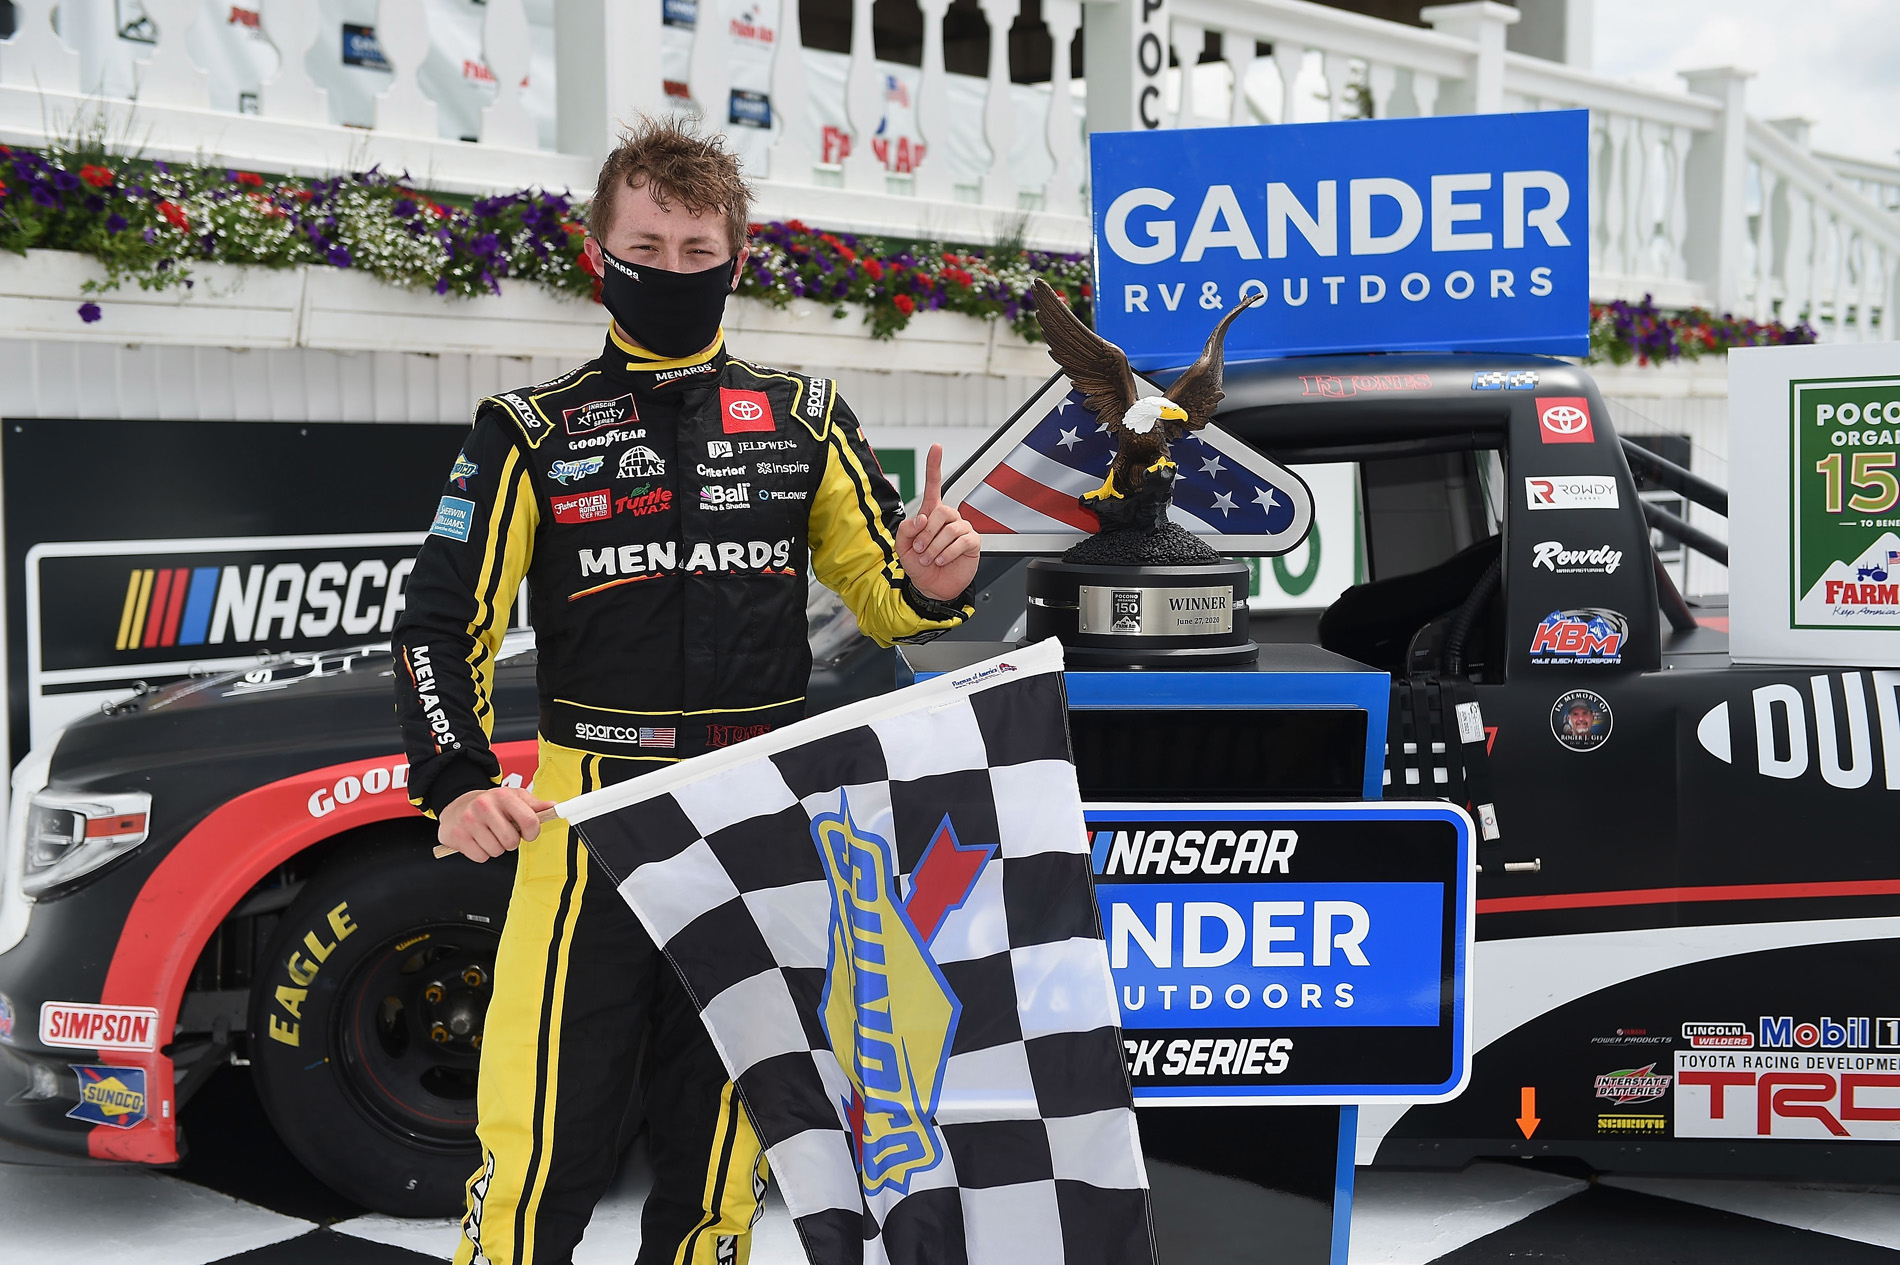 NASCAR Gander RV & Outdoors Truck Series Pocono Organics 150 to benefit Farm Aid